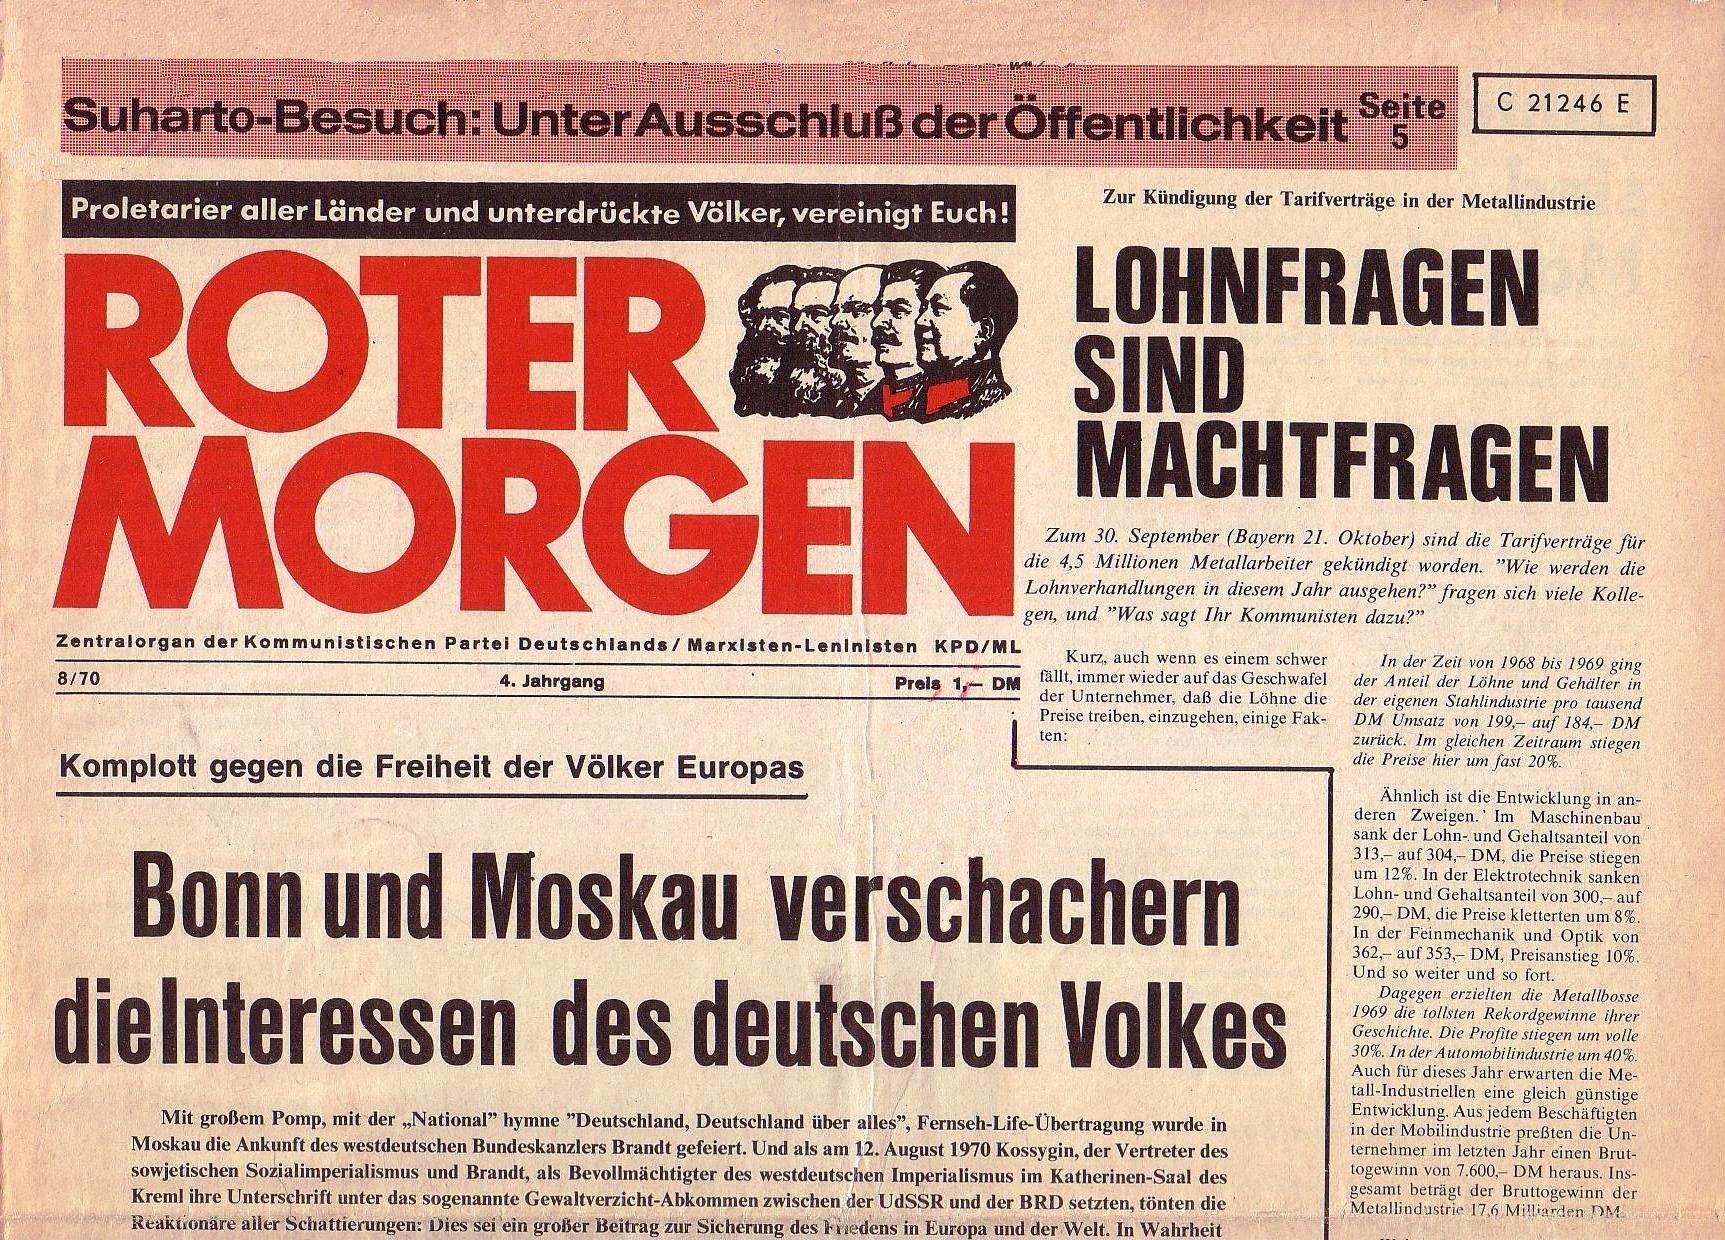 Roter Morgen, 4. Jg., September 1970, Nr. 8, Seite 1a